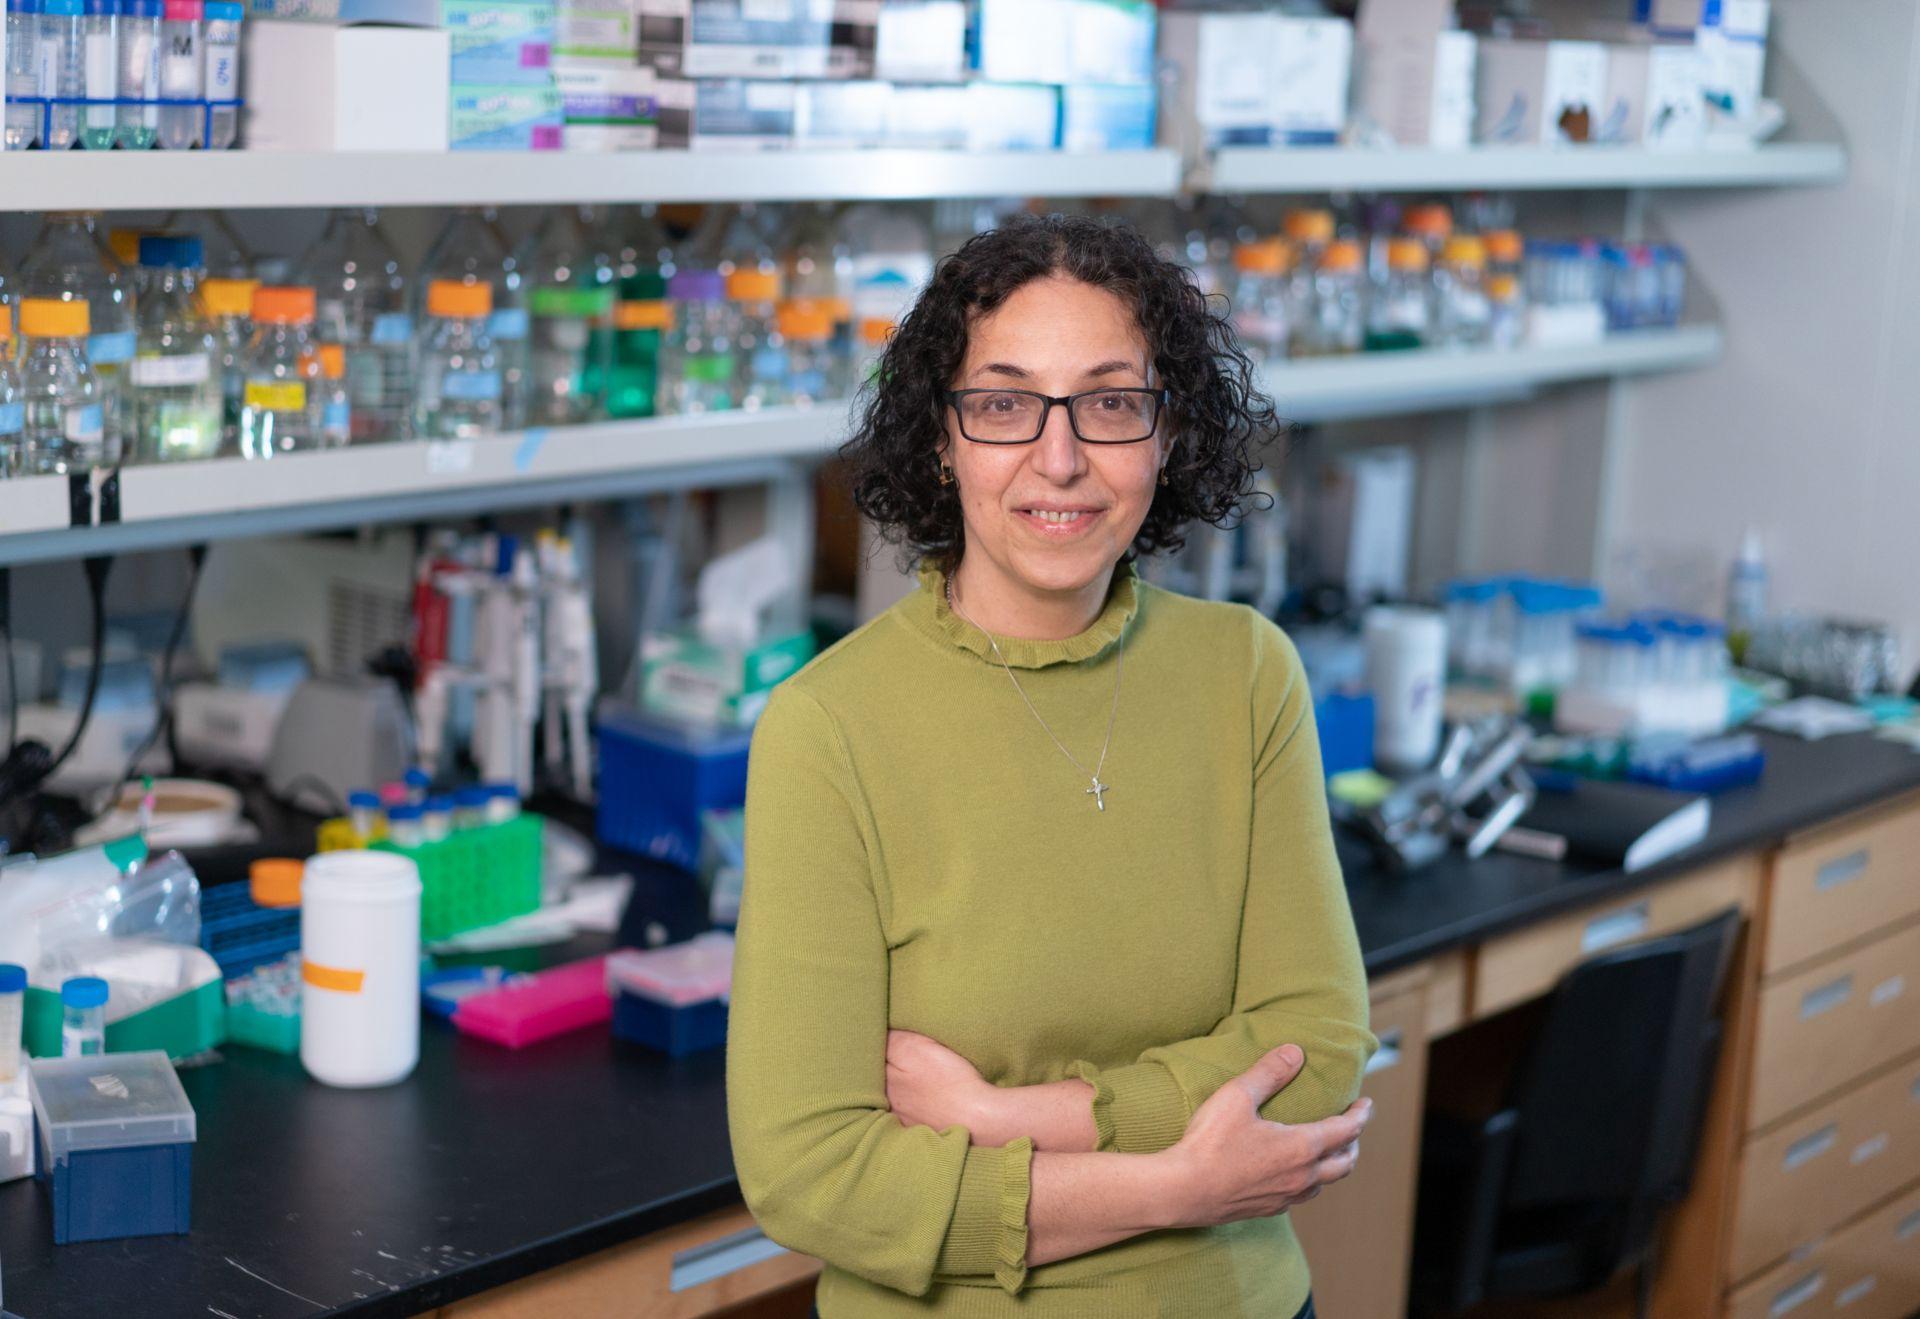 Nafiseh Sabri, PhD